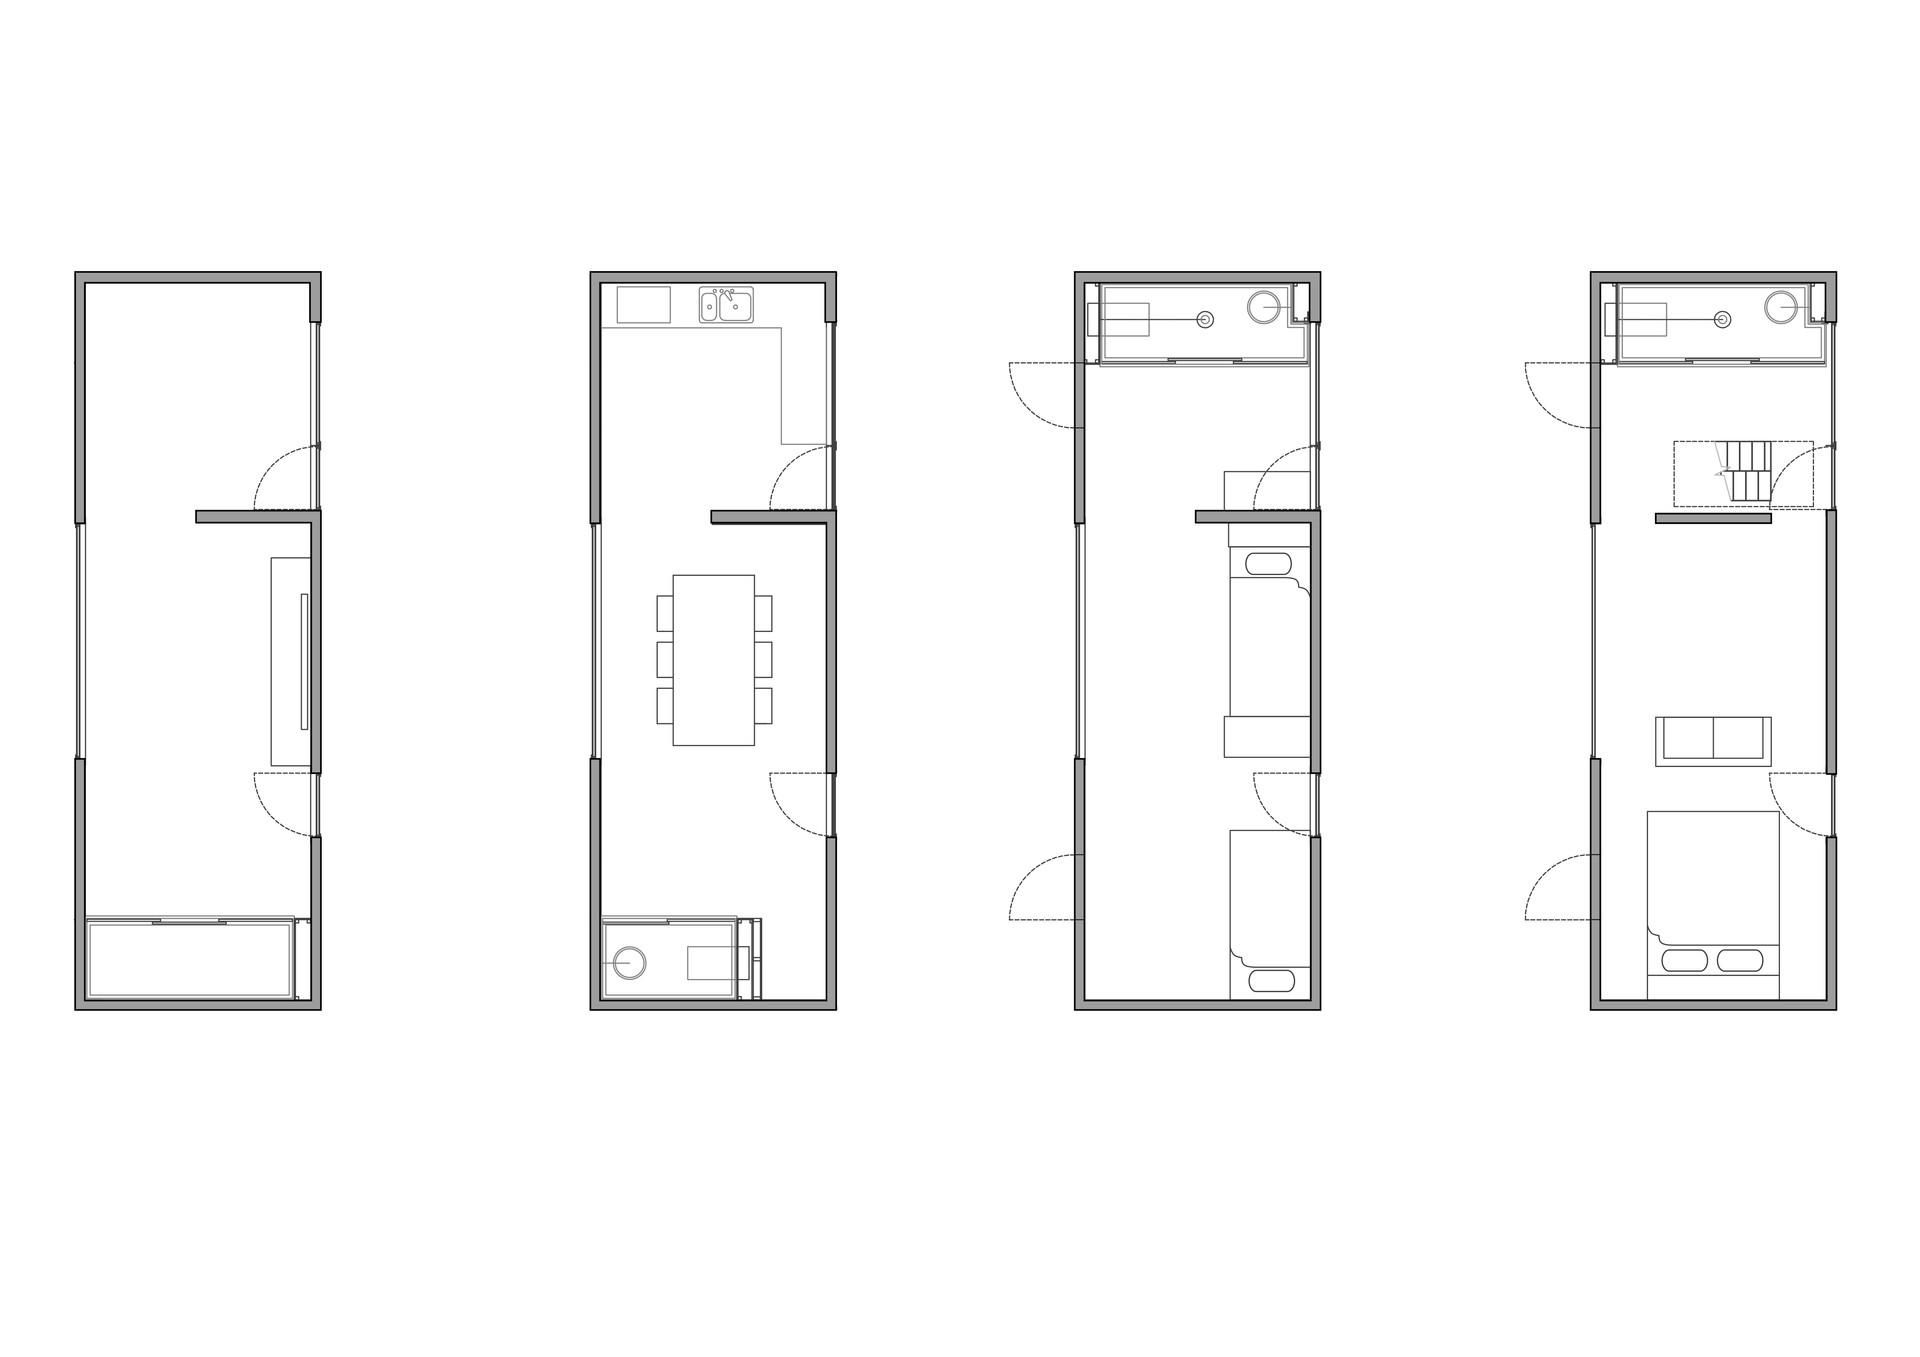 PTT01-ihouse-Plan.jpg